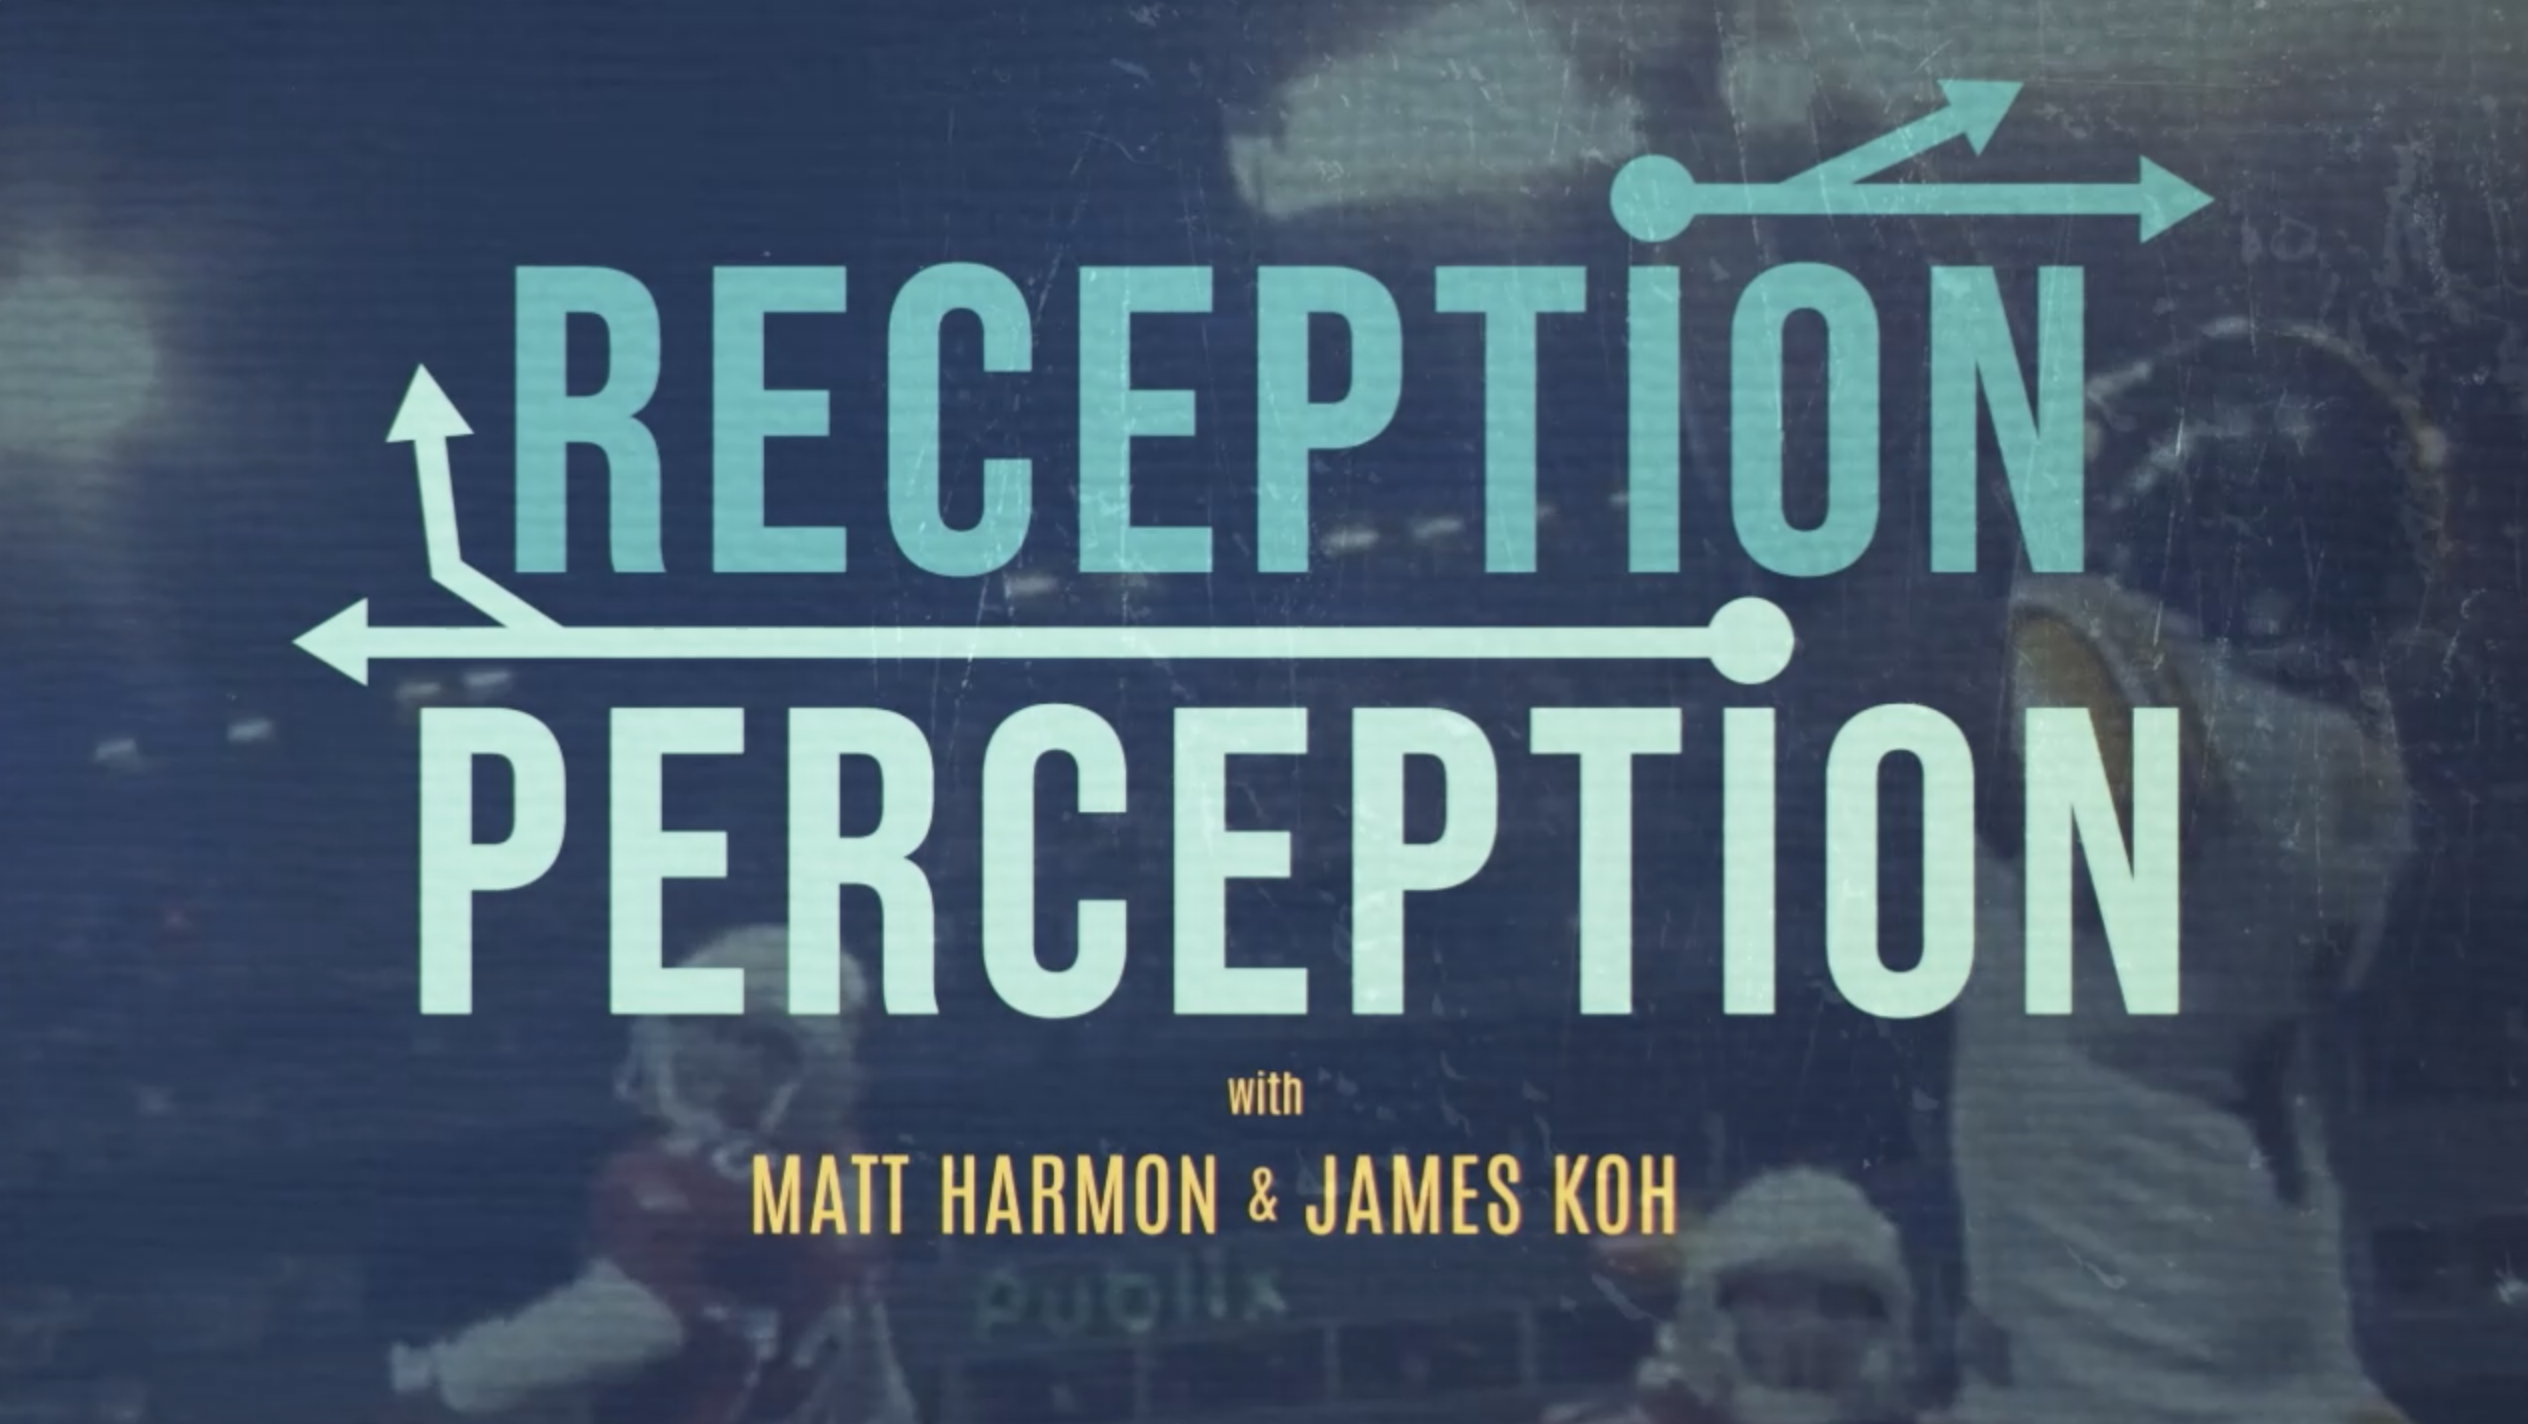 Reception Perception Show Episode 1: NFL Draft WR Recap